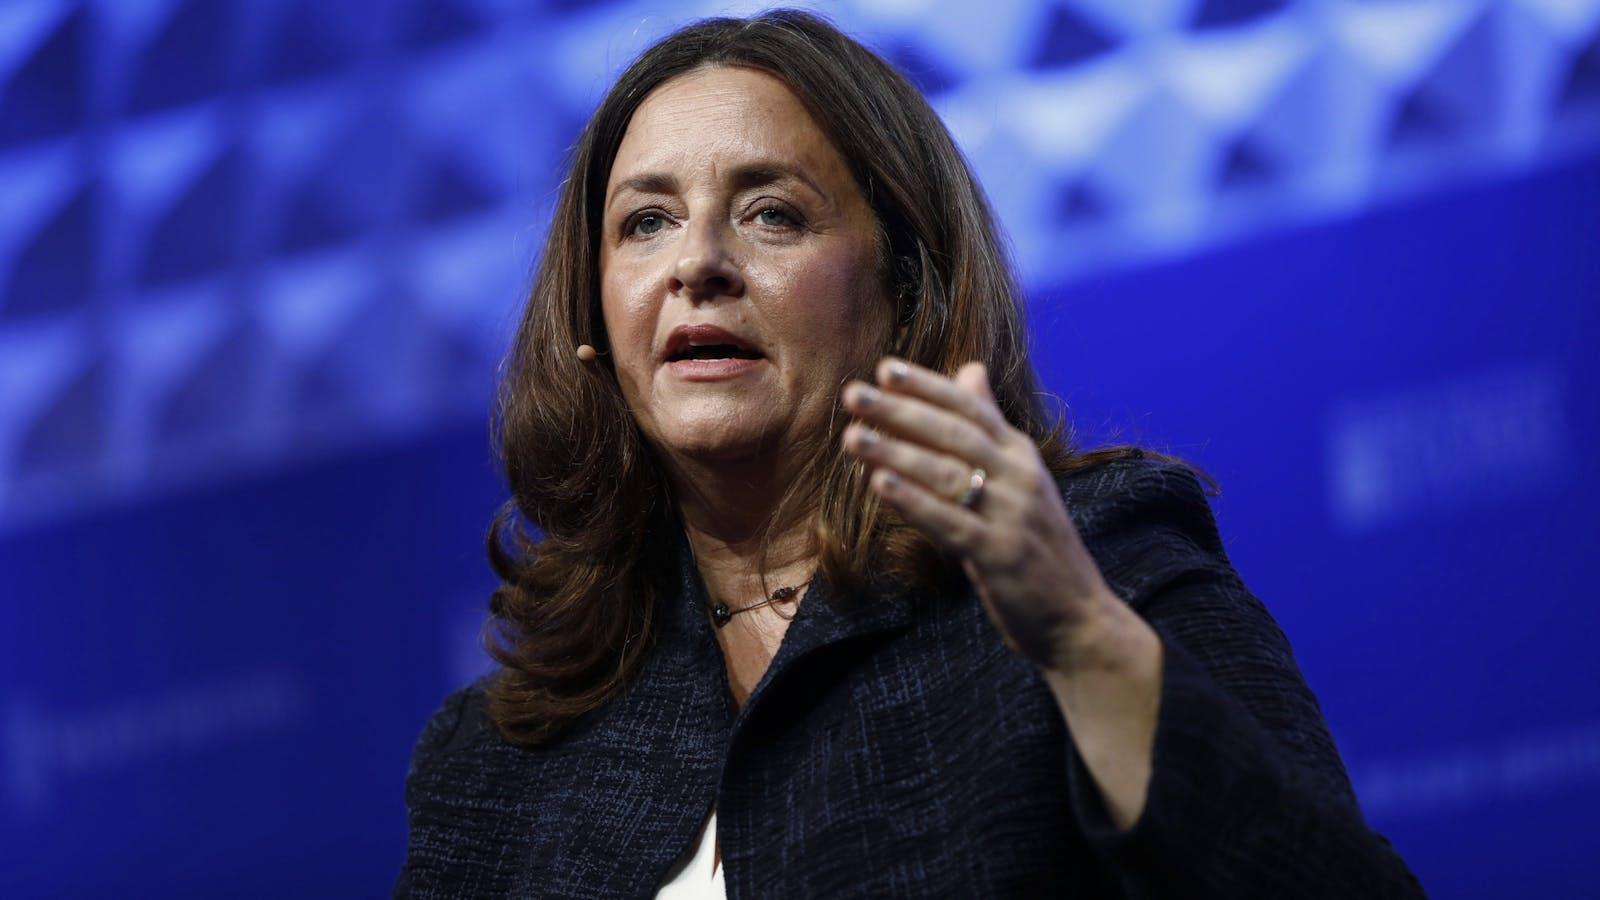 Susanne Daniels. Photo by Bloomberg.